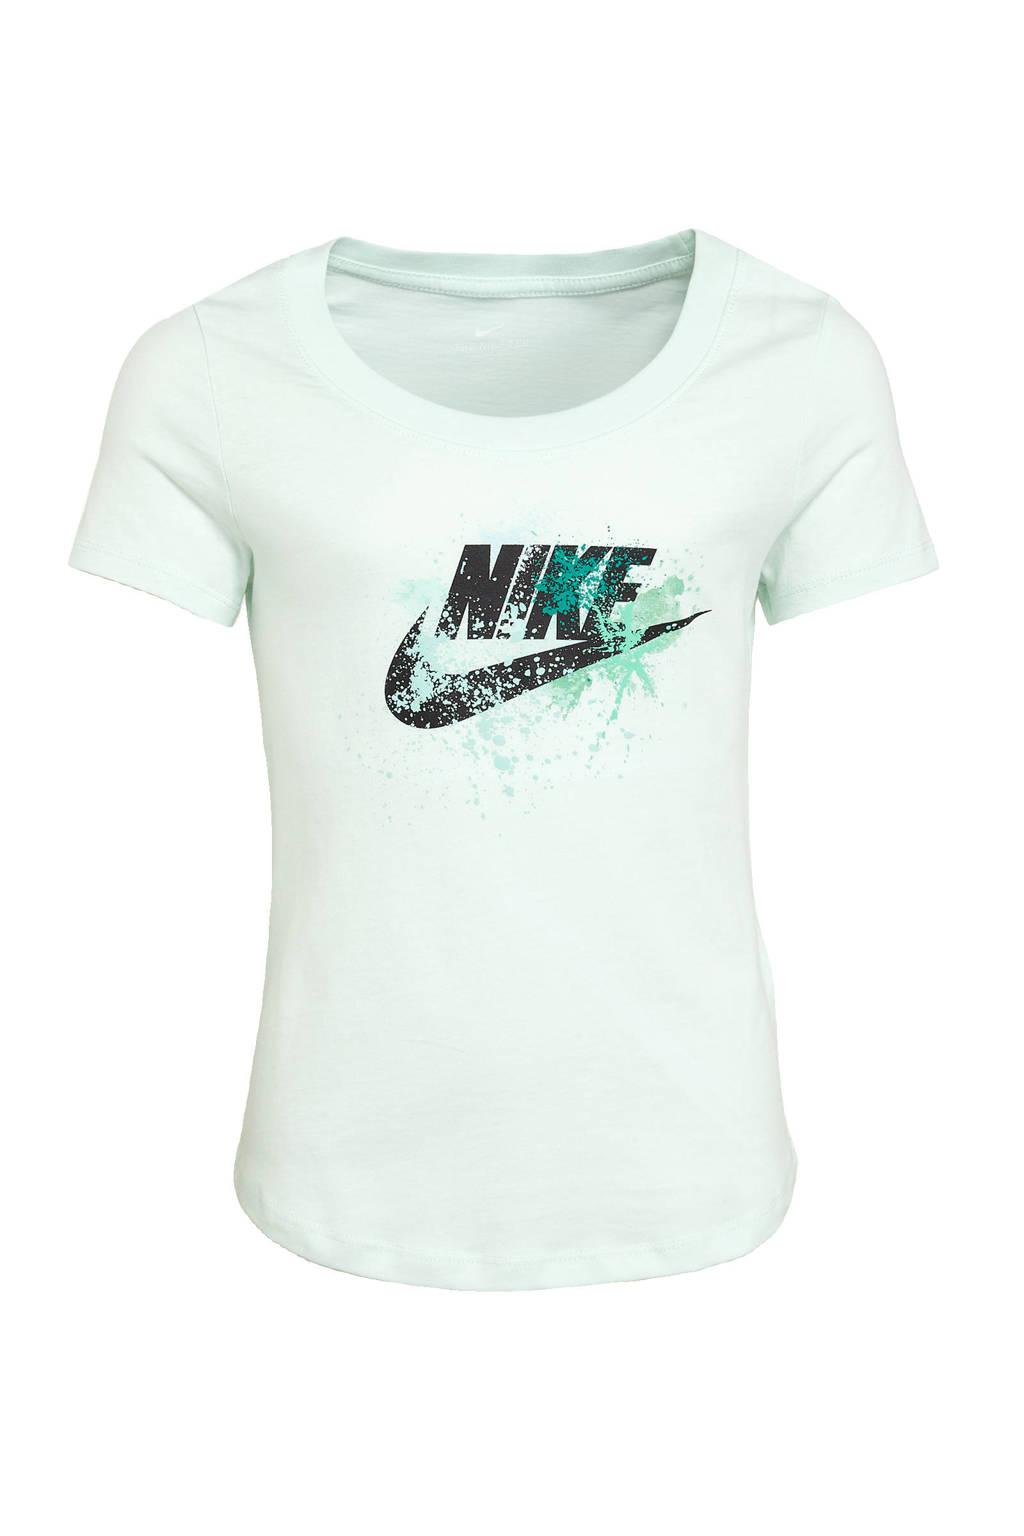 Nike T-shirt lichtgroen, Lichtgroen